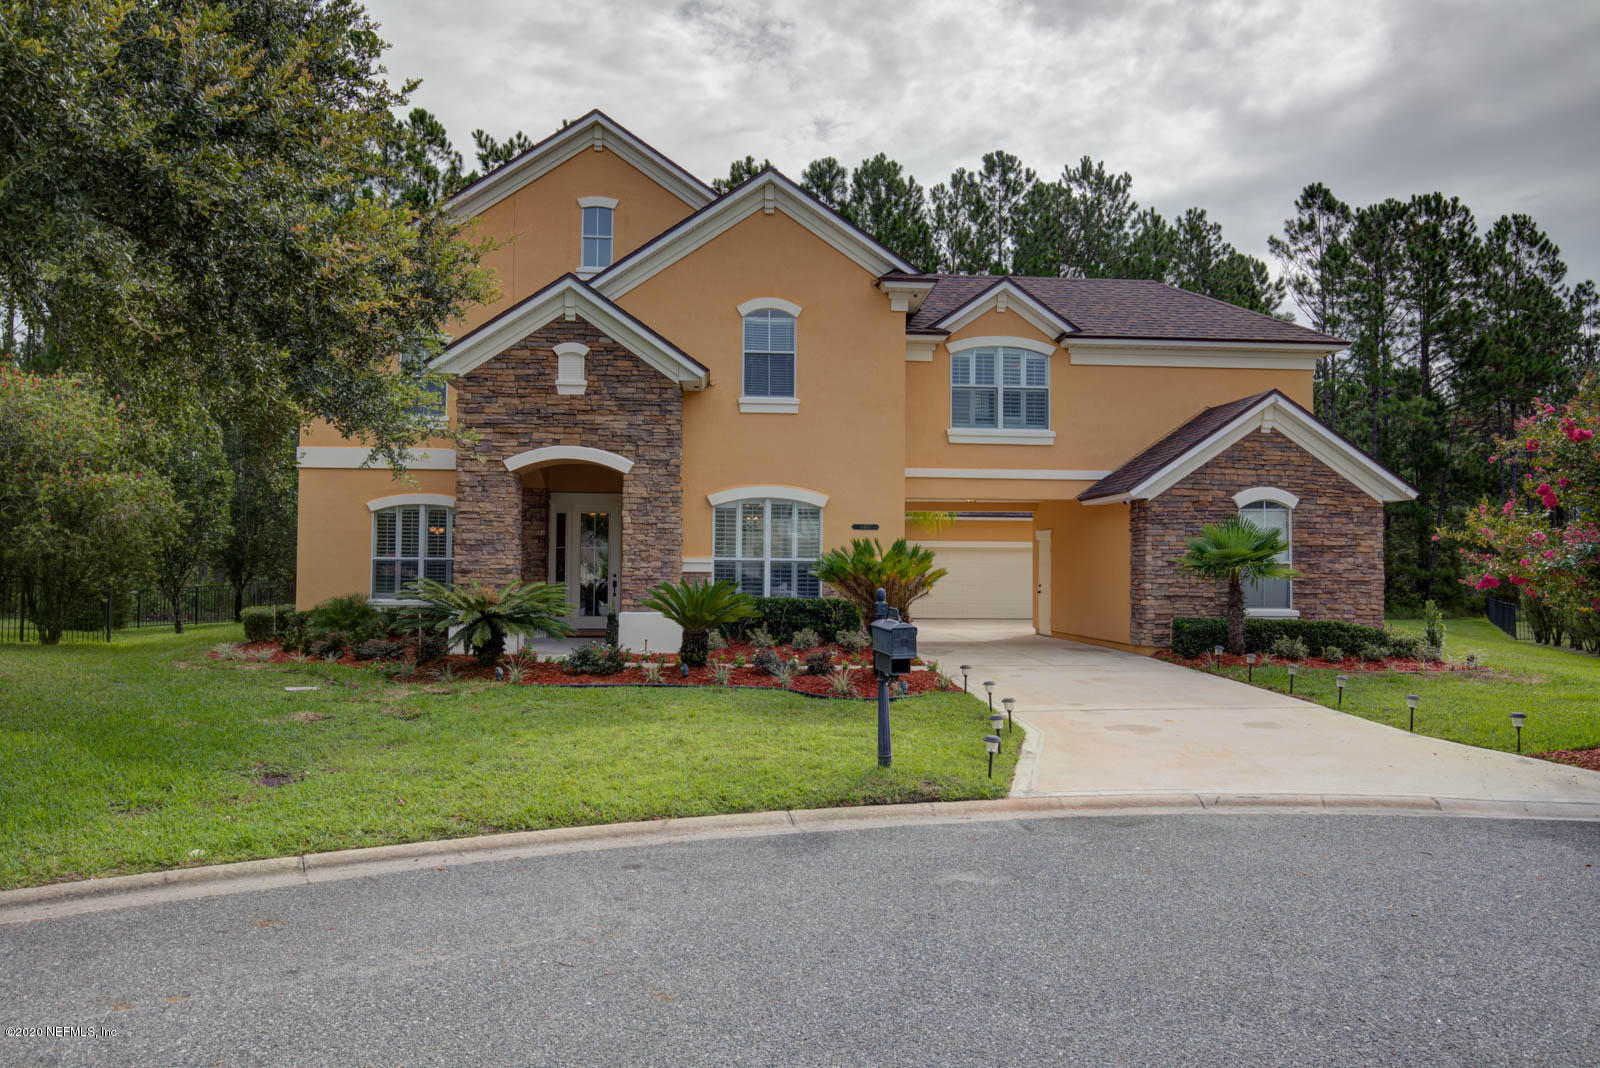 4400 GRAY HERON, ORANGE PARK, FLORIDA 32065, 6 Bedrooms Bedrooms, ,4 BathroomsBathrooms,Residential,For sale,GRAY HERON,1066161